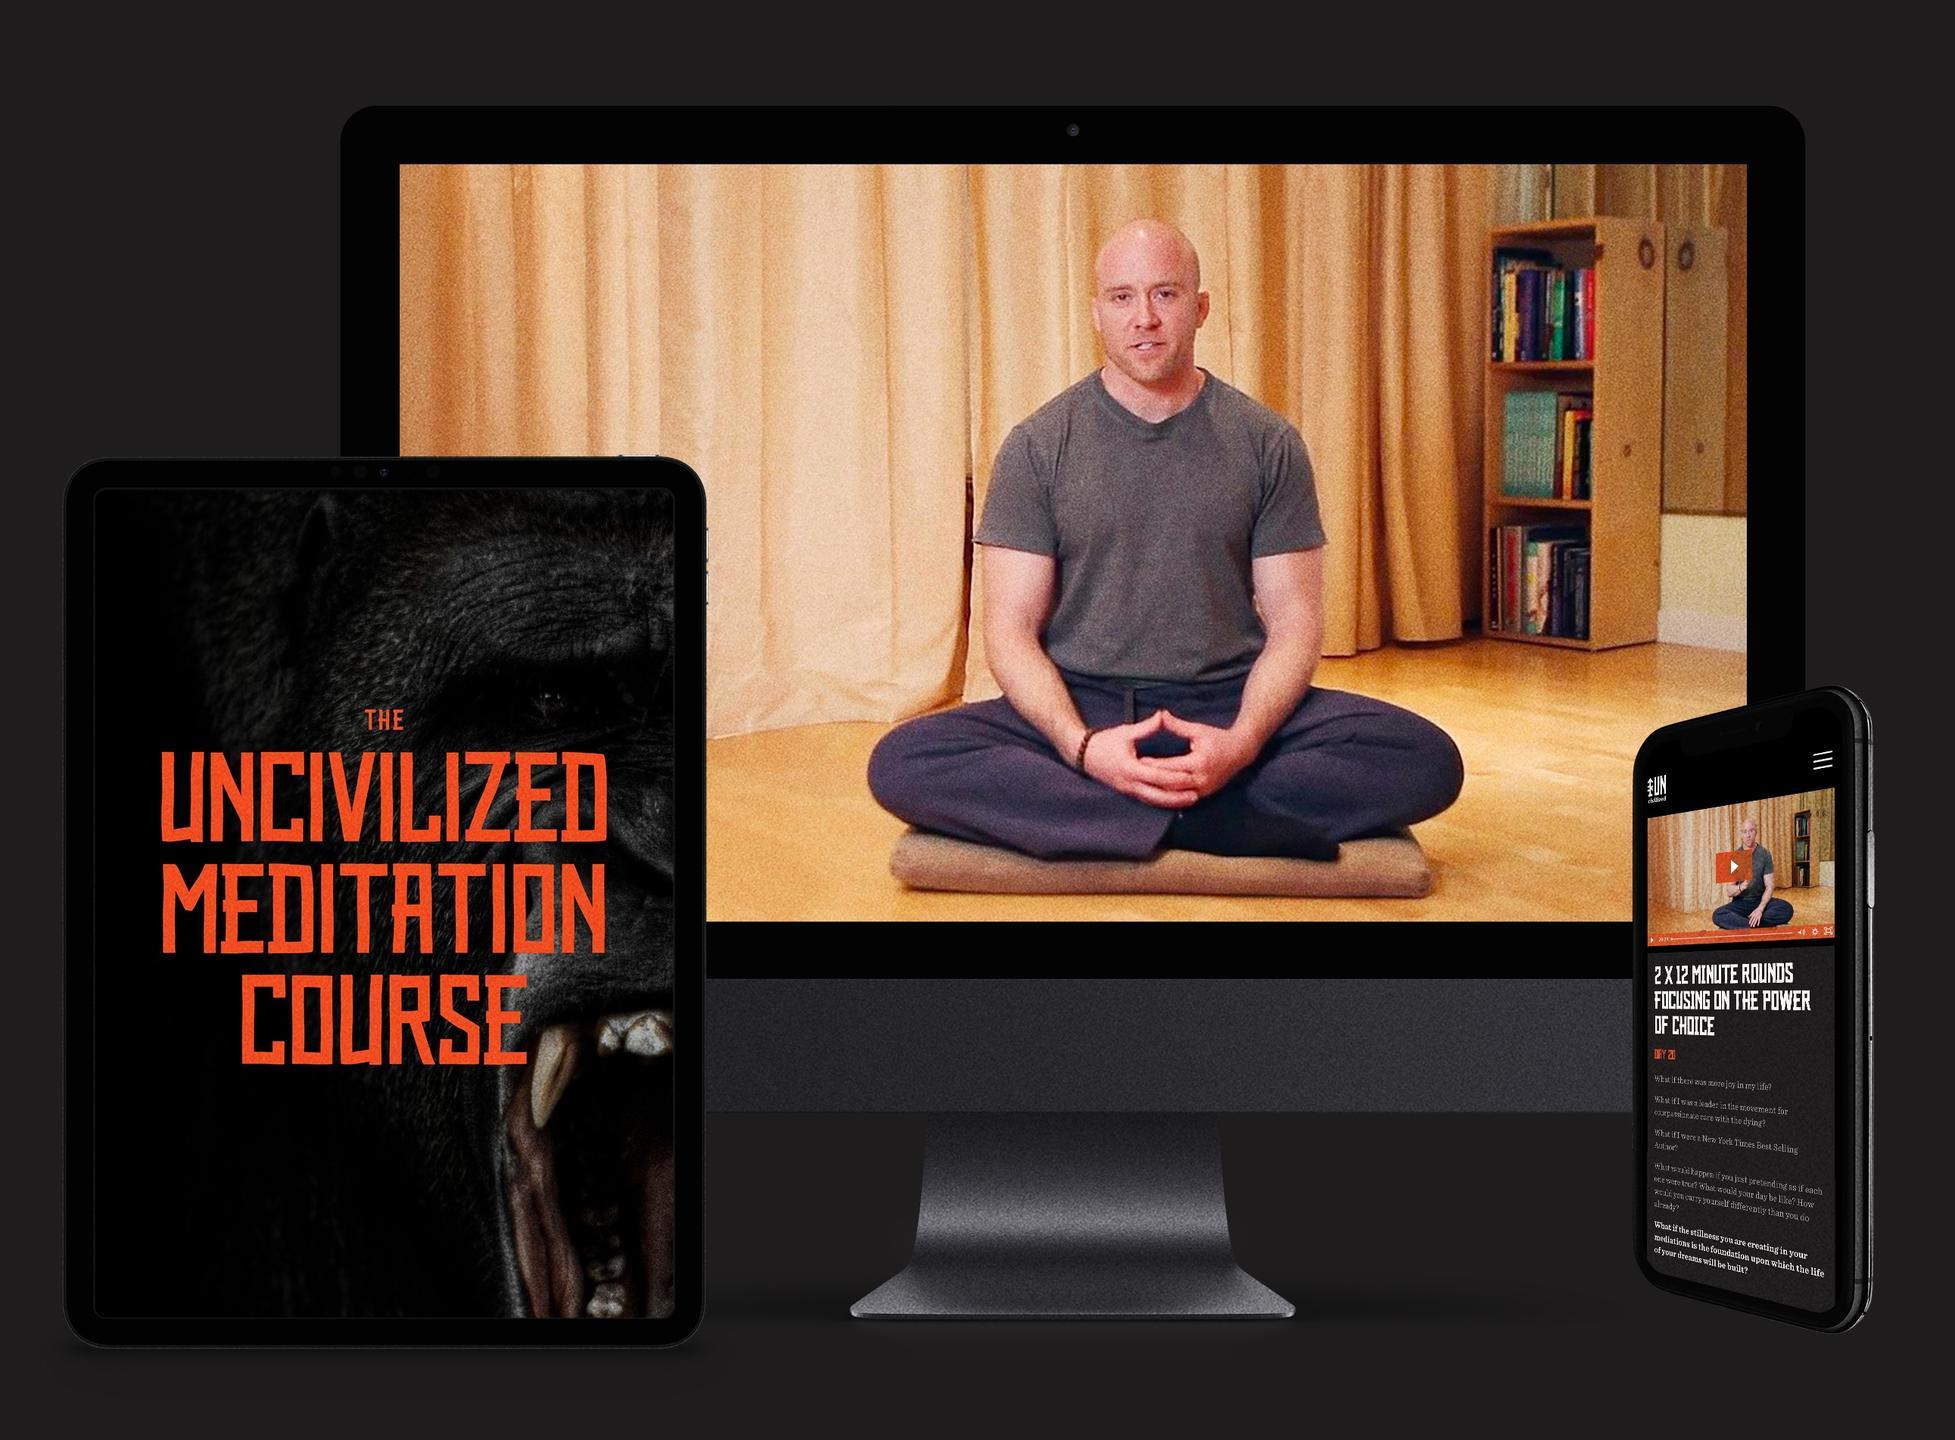 UNcivilized Meditation Course Materials